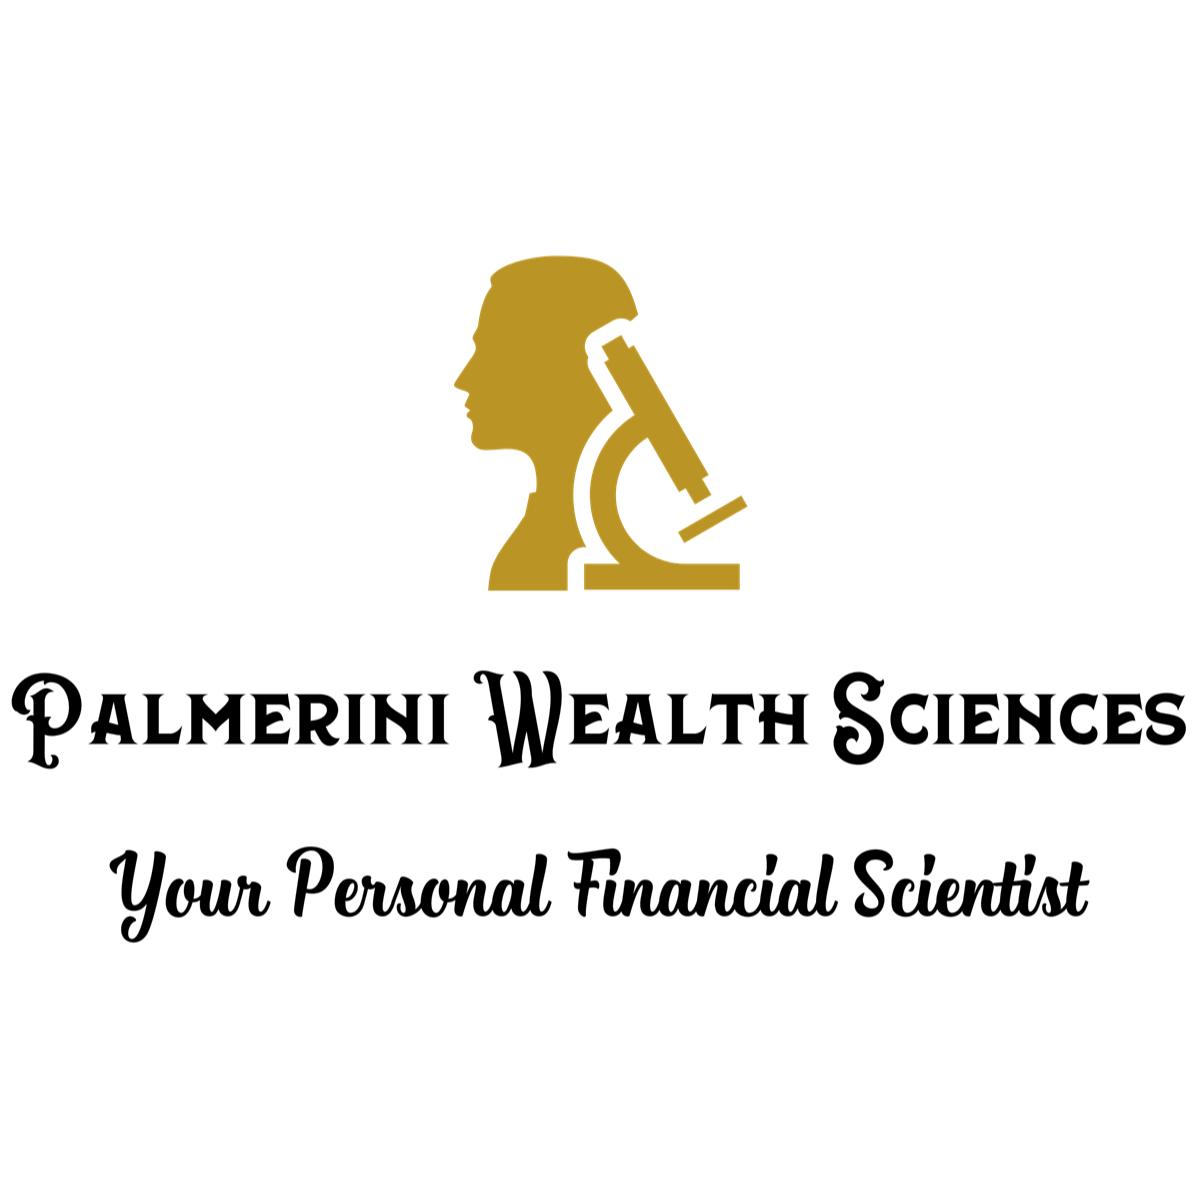 Palmerini Wealth Sciences